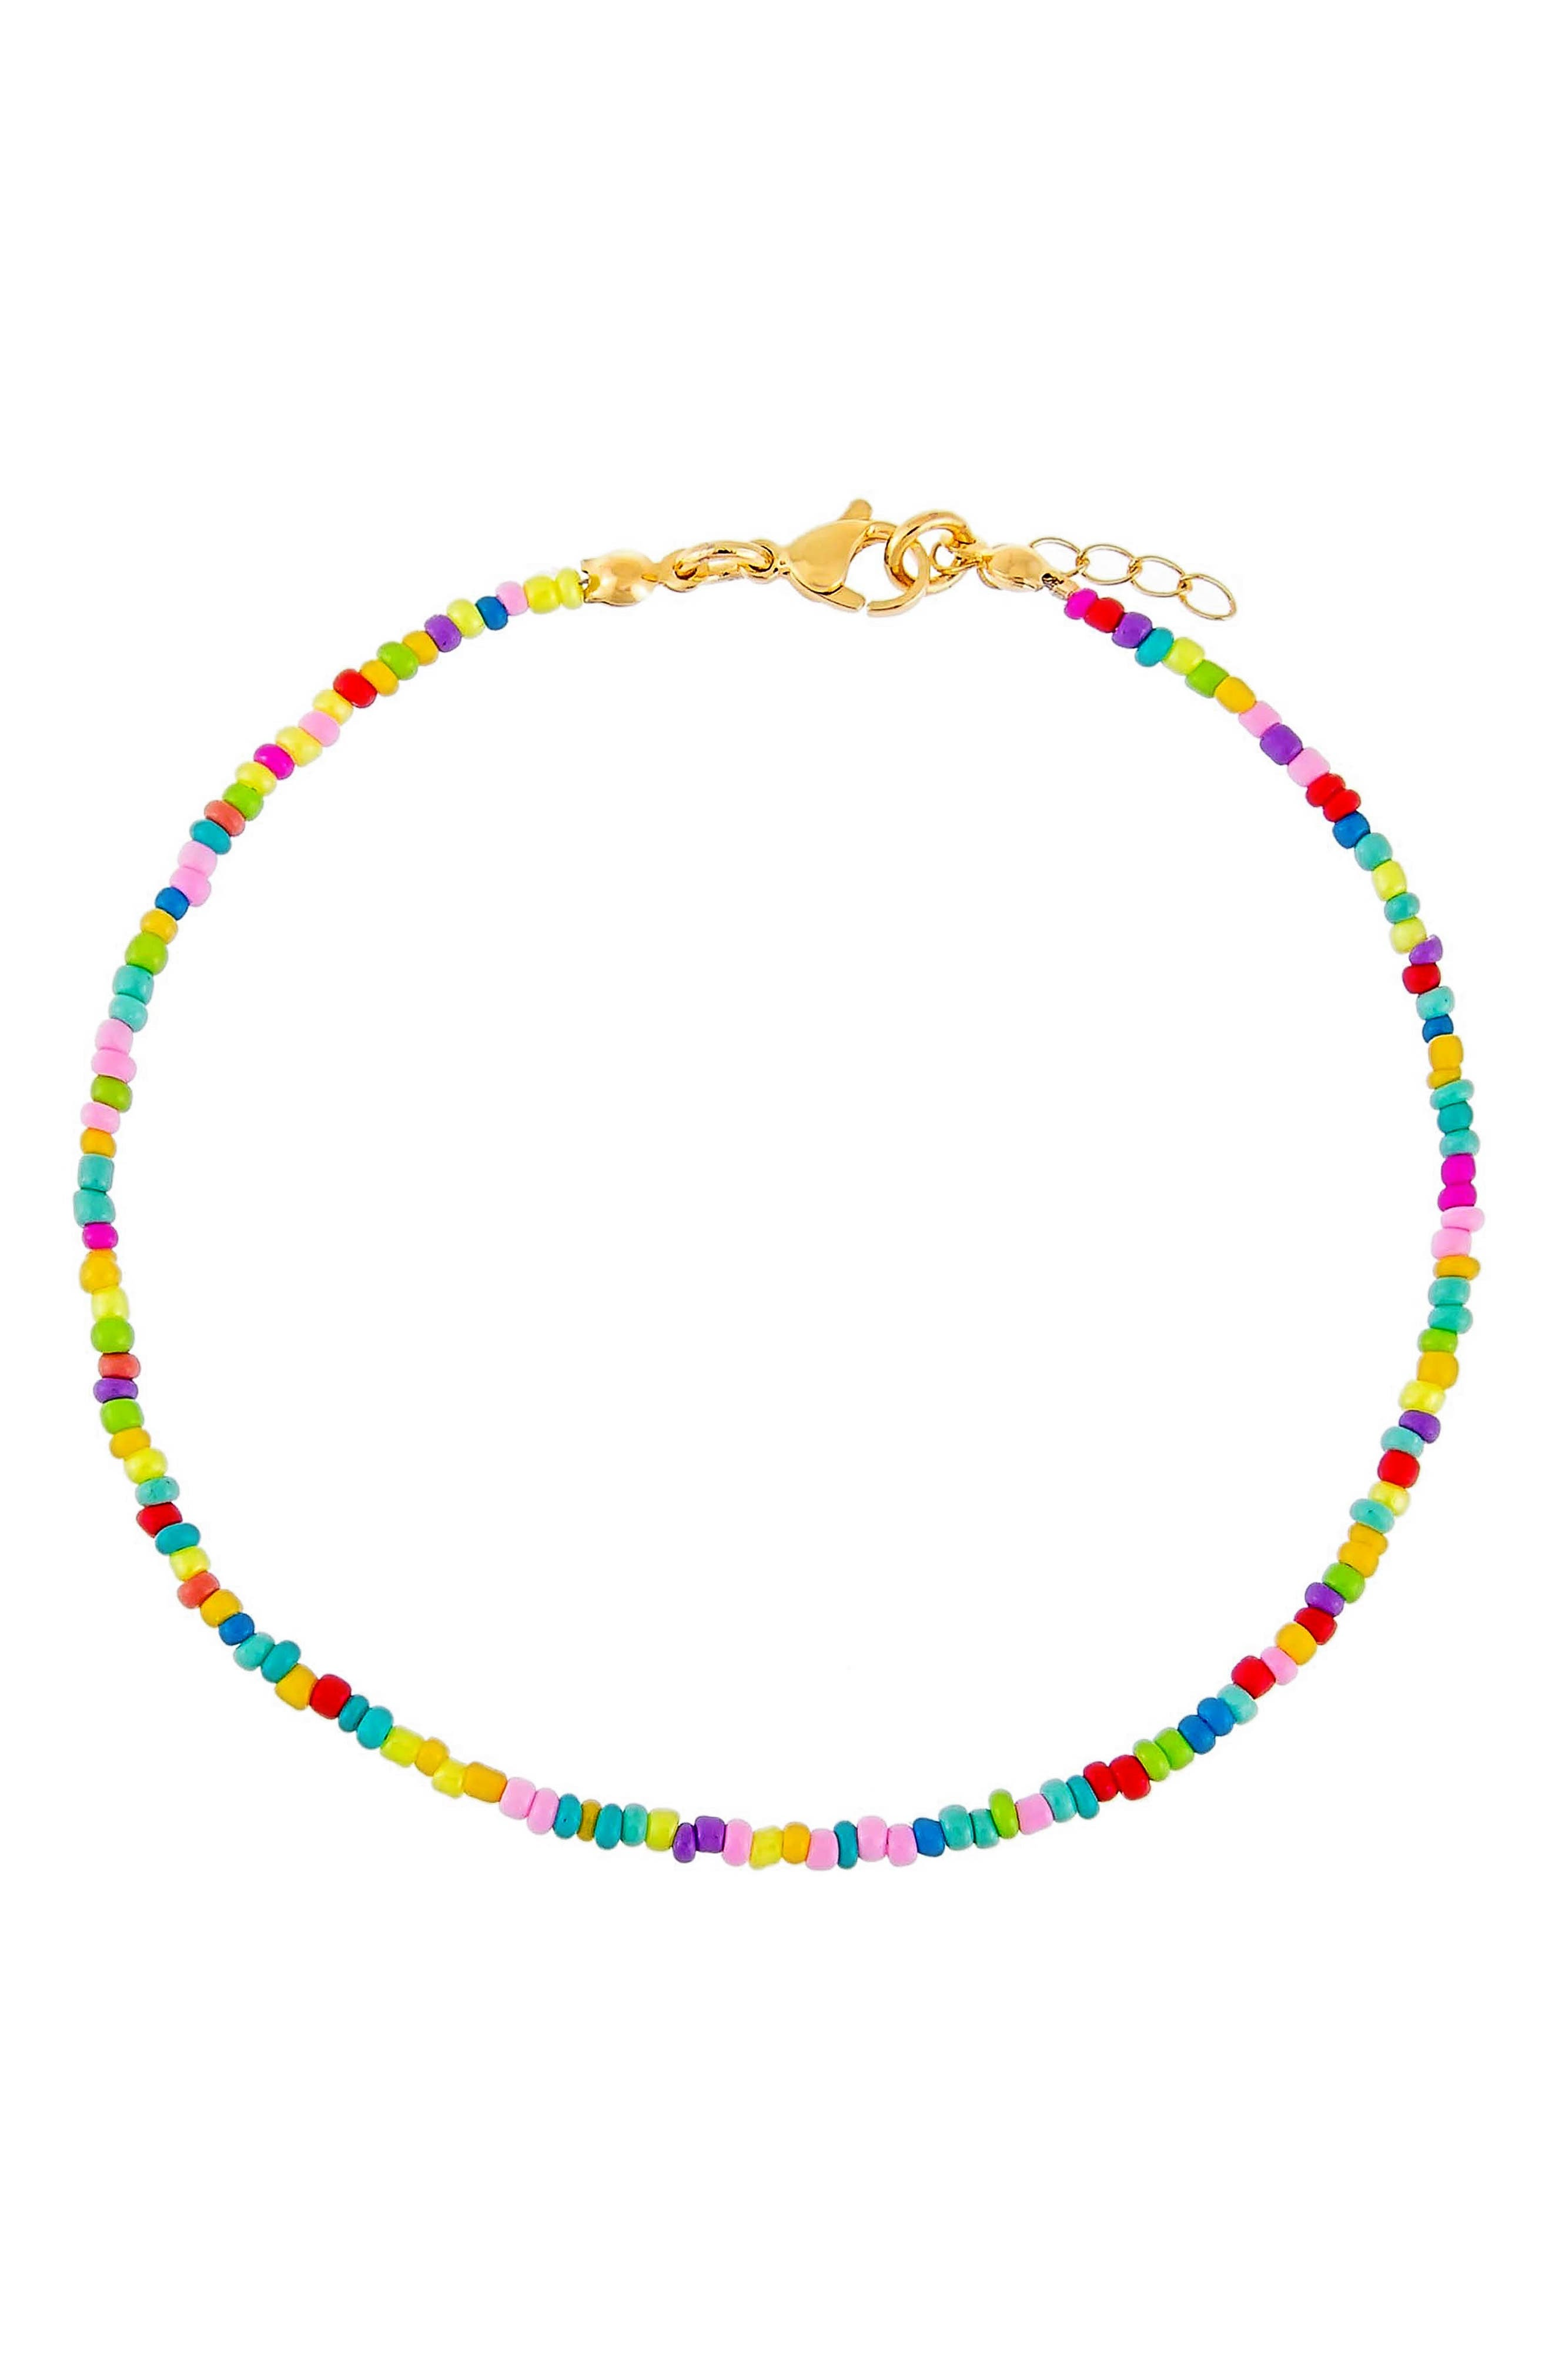 Women's Adina's Jewels Rainbow Beaded Anklet